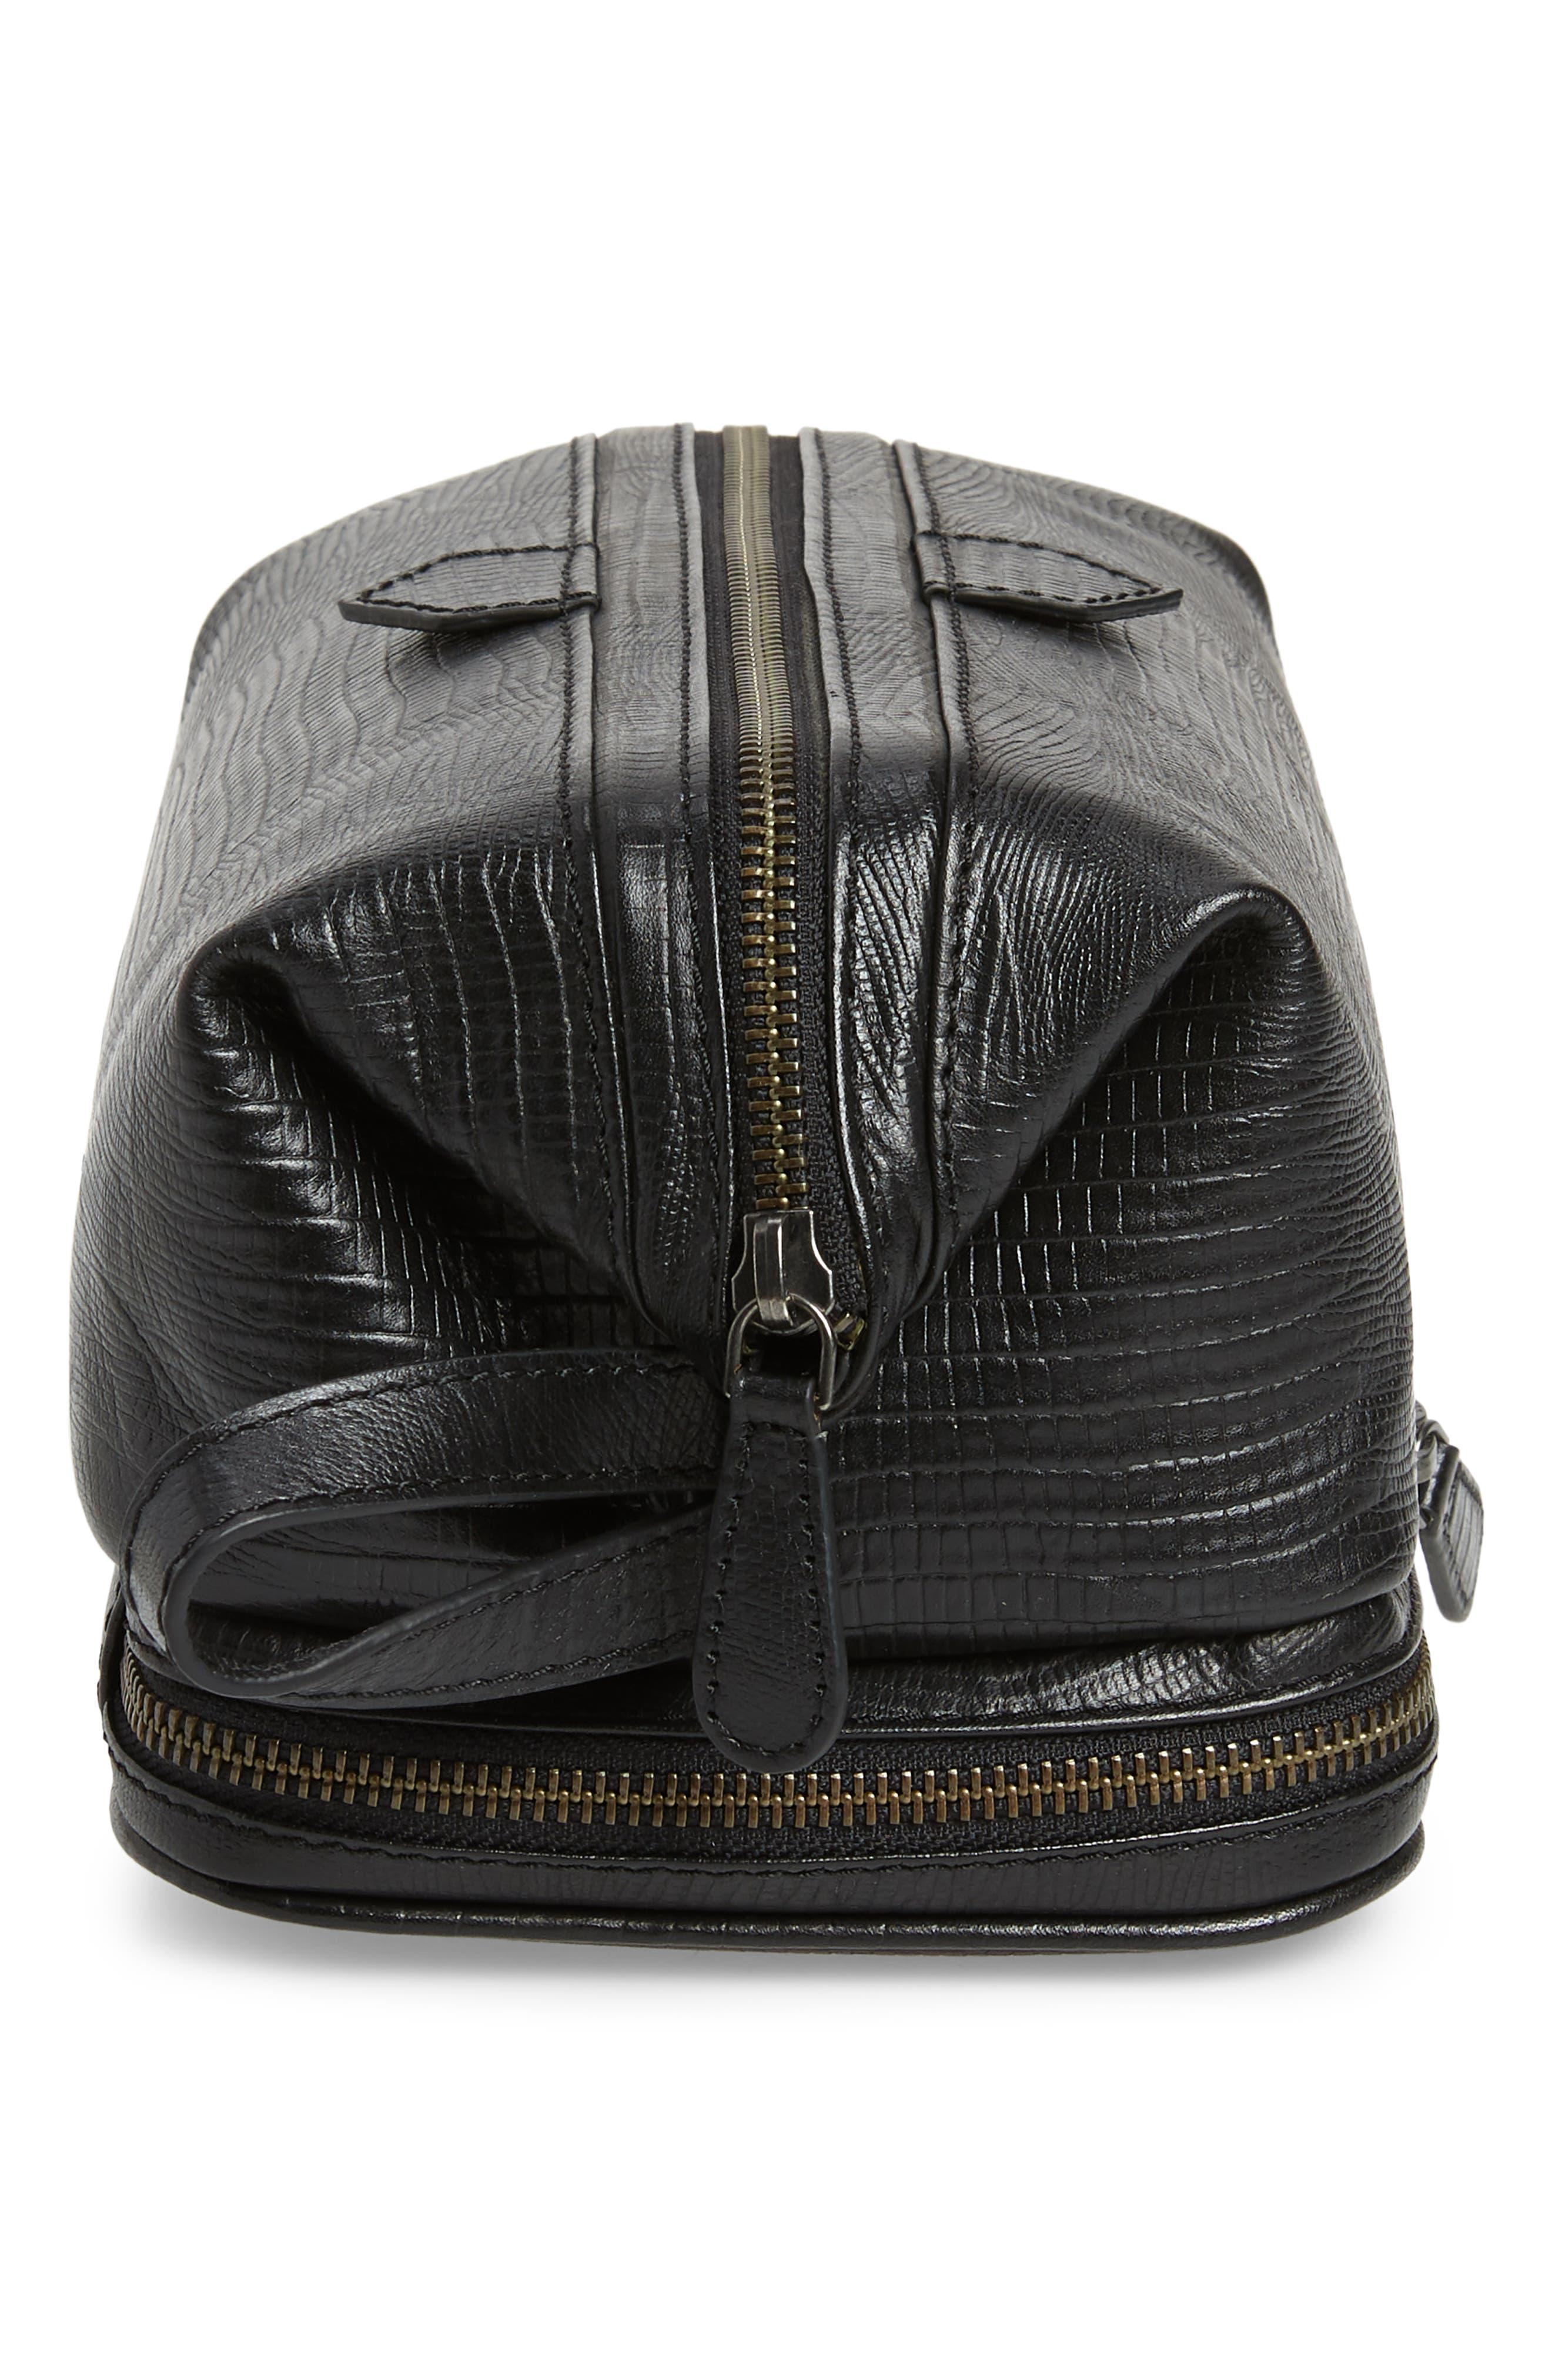 TED BAKER LONDON,                             Leather Travel Kit,                             Alternate thumbnail 4, color,                             BLACK